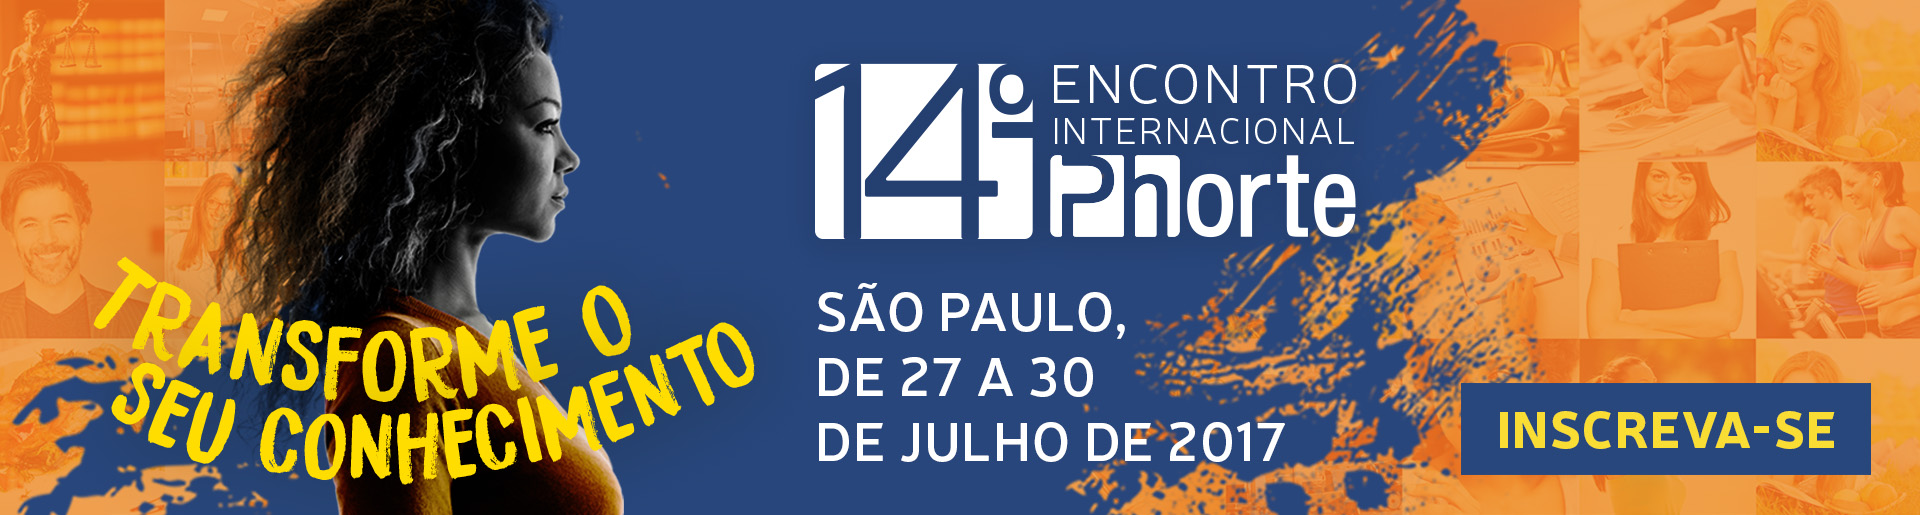 14º Encontro Internacional Phorte